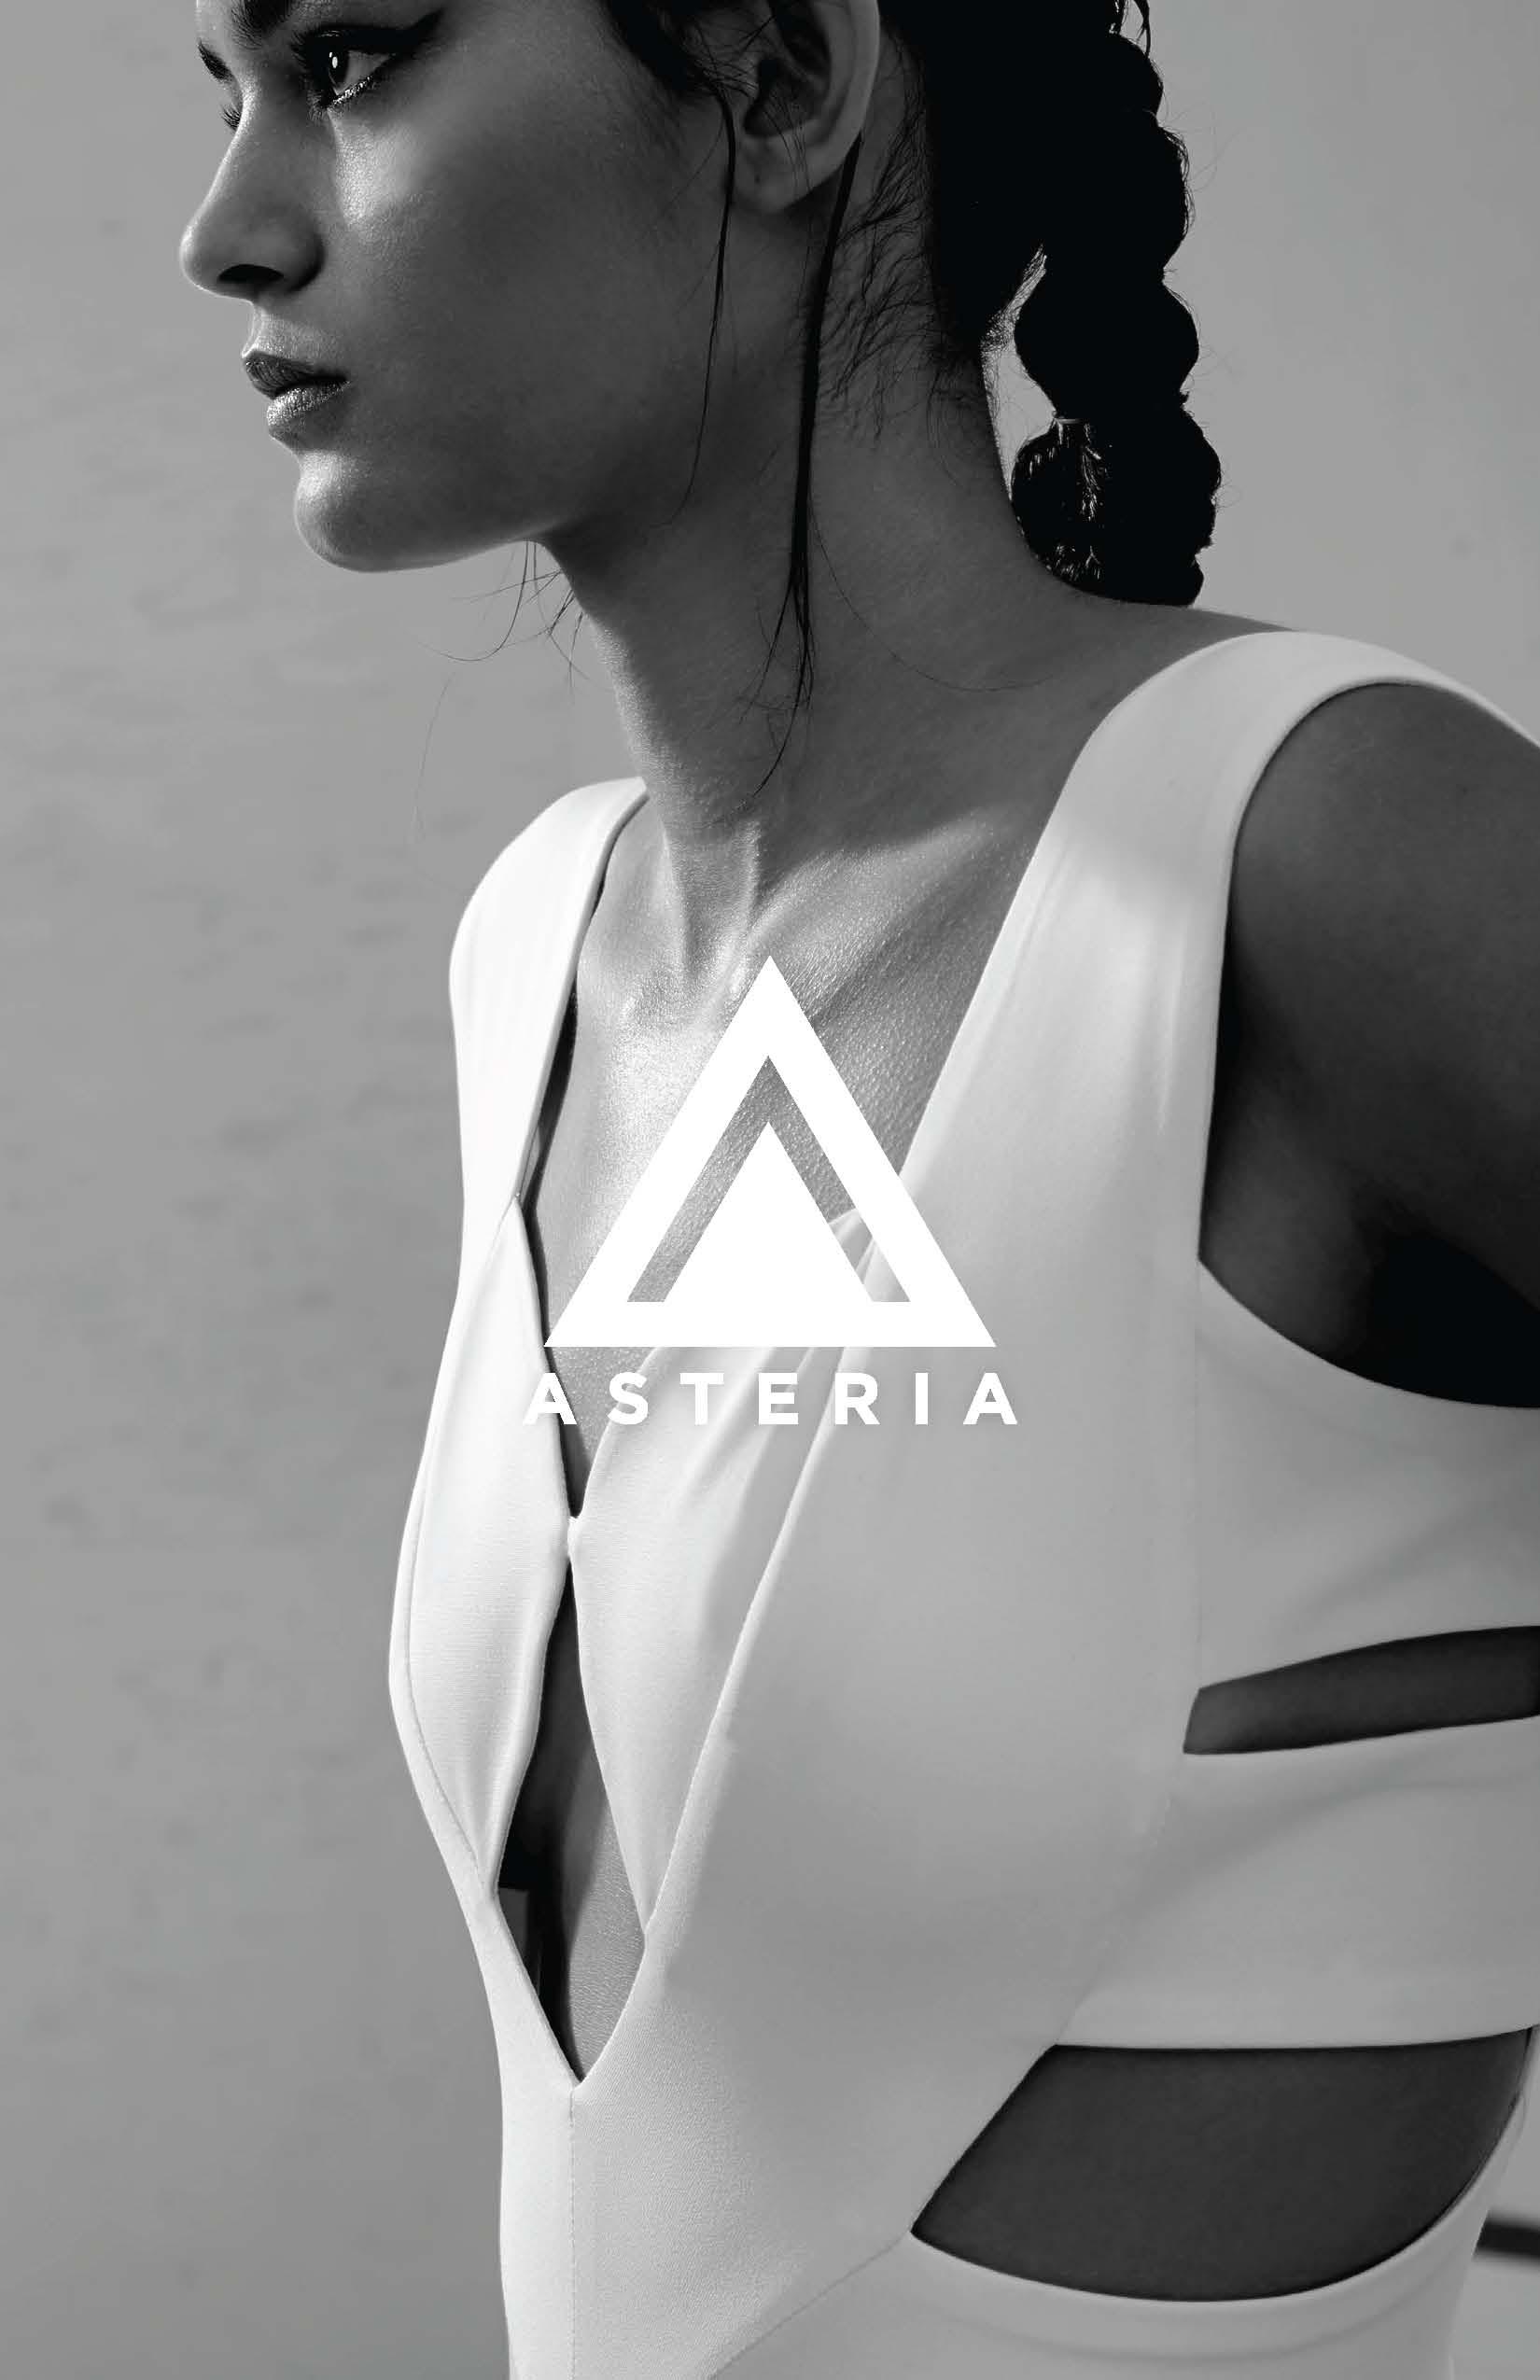 ASTERIA_ACTIVE_2015_Lookbook 1.jpg